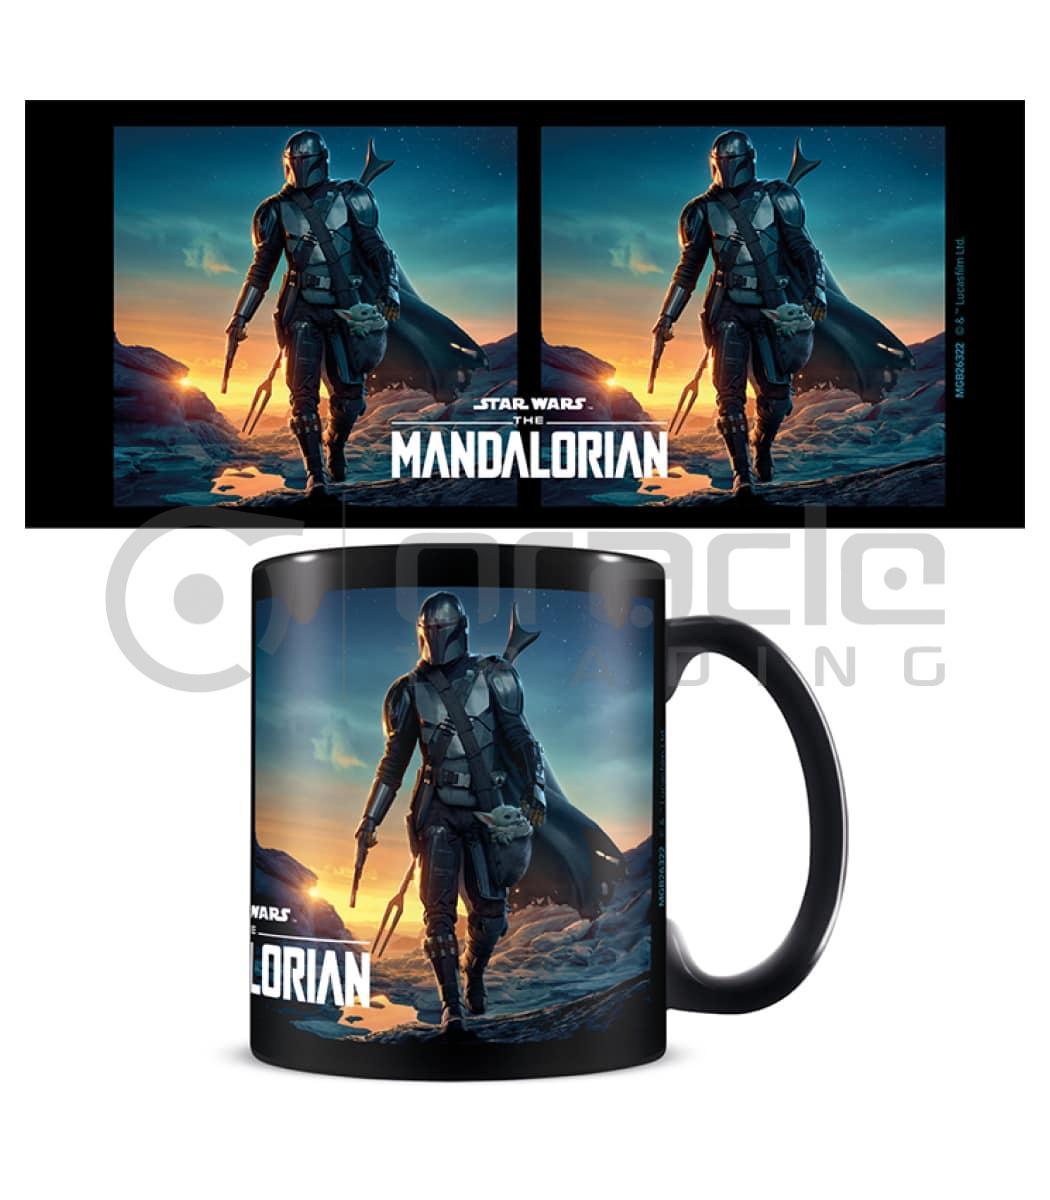 Star Wars: The Mandalorian Mug - Nightfall (Inner Coloured)